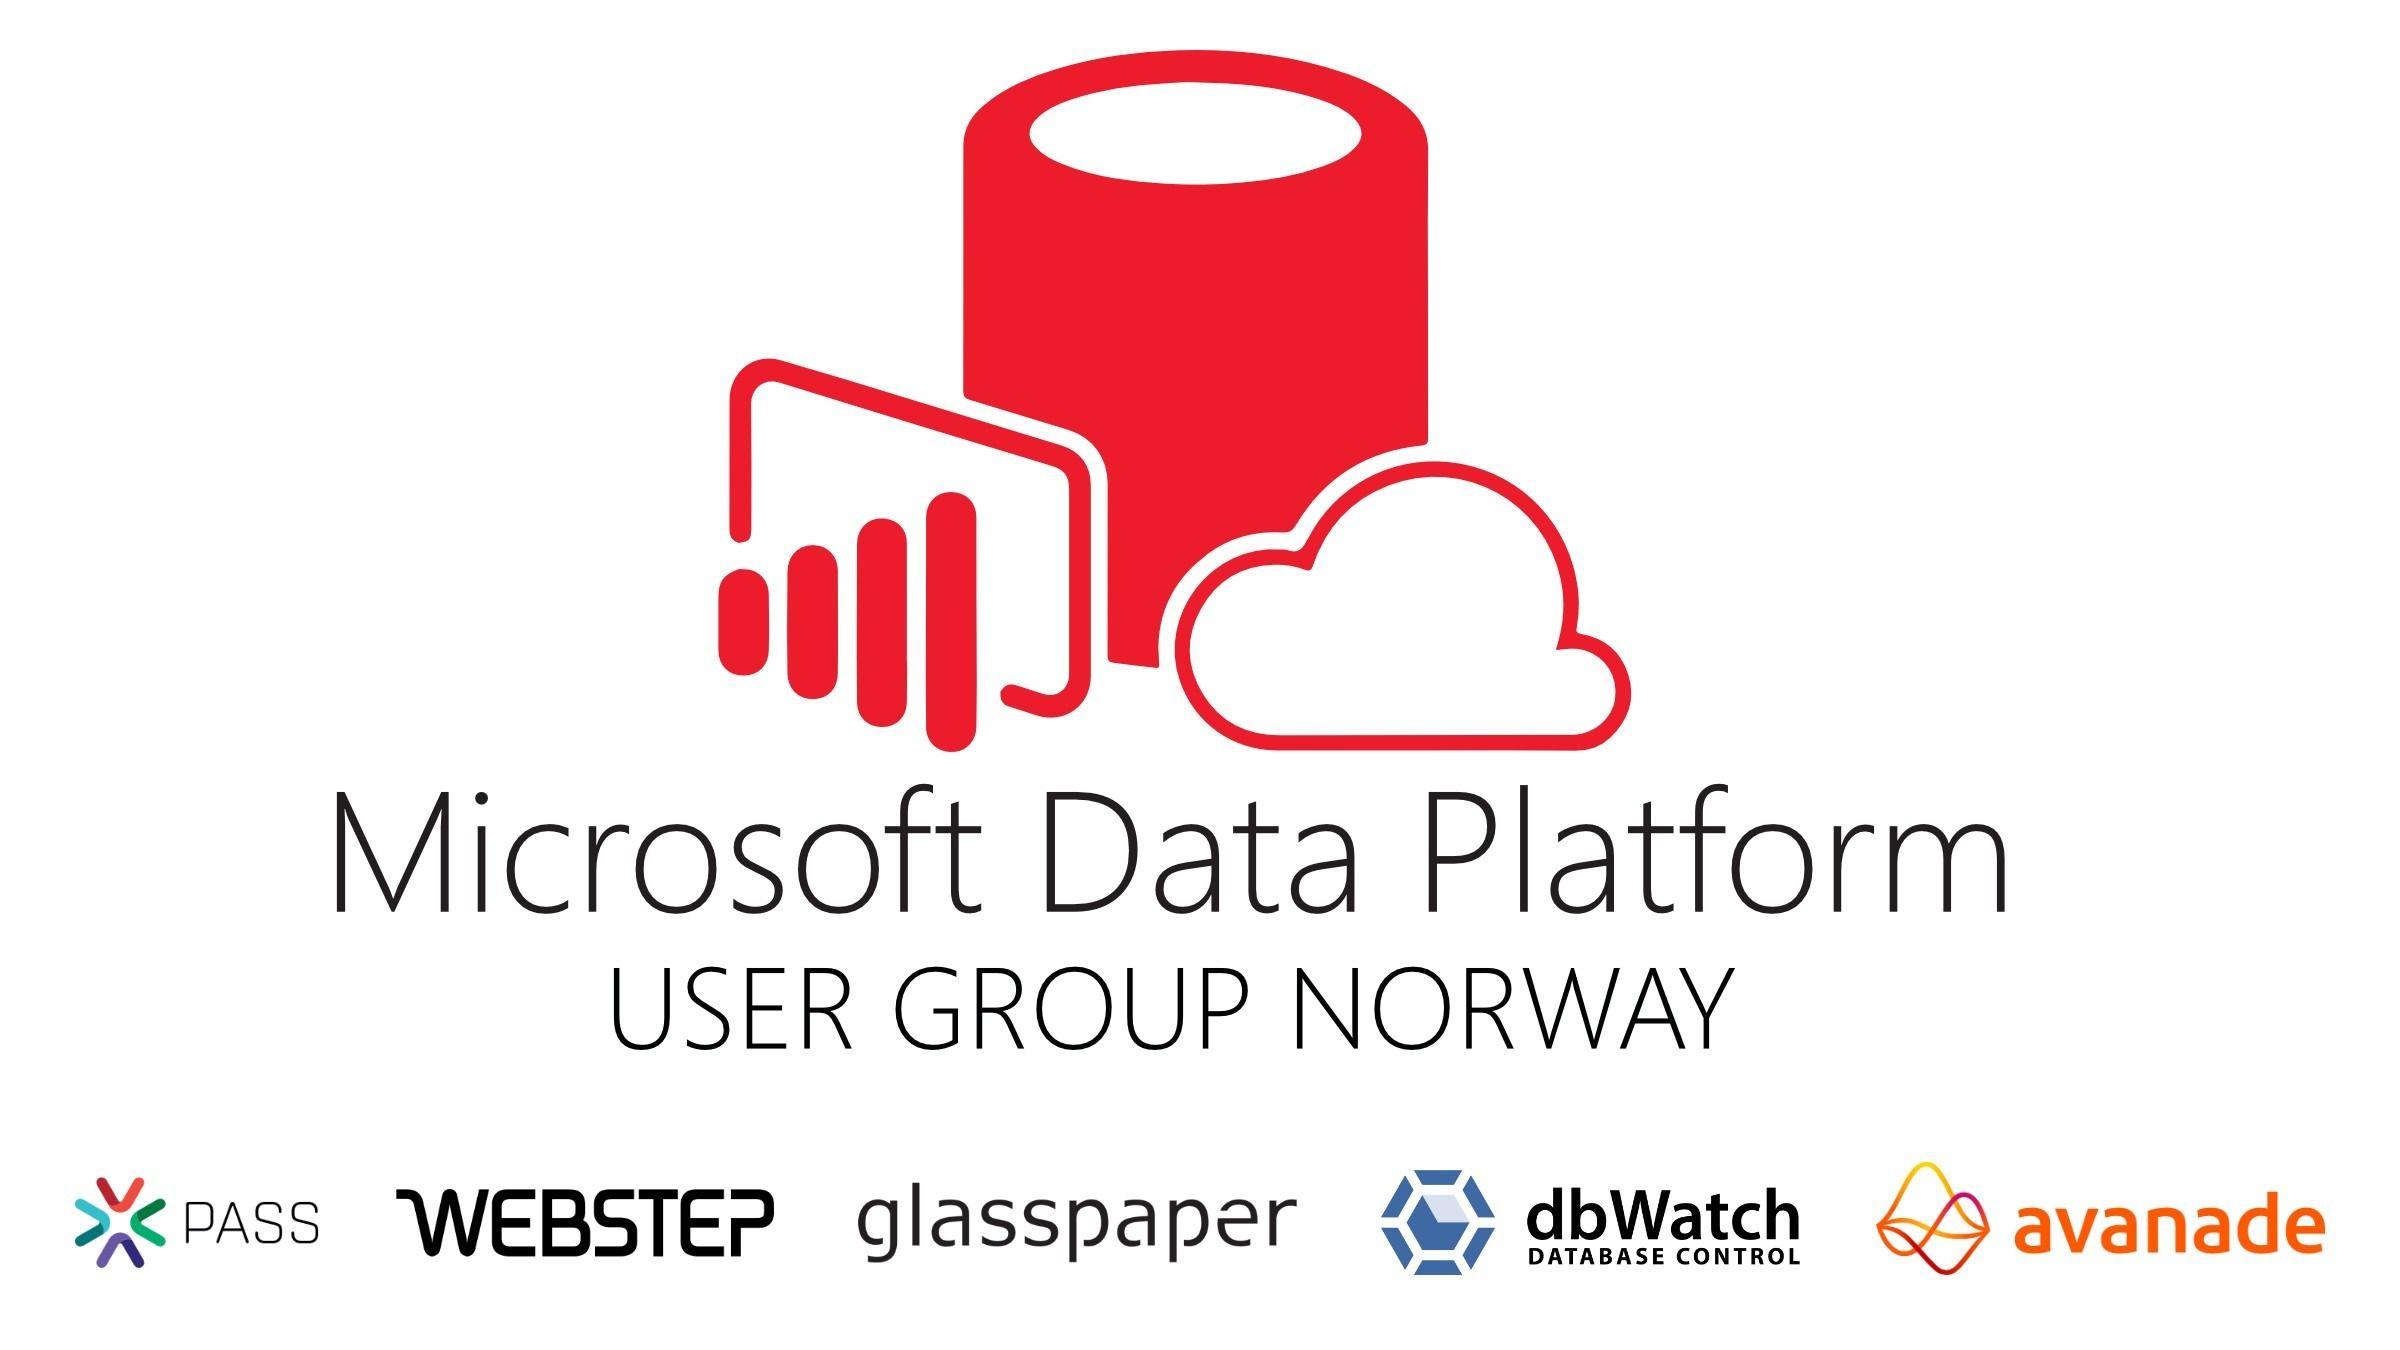 Microsoft Data Platform User Group Norway